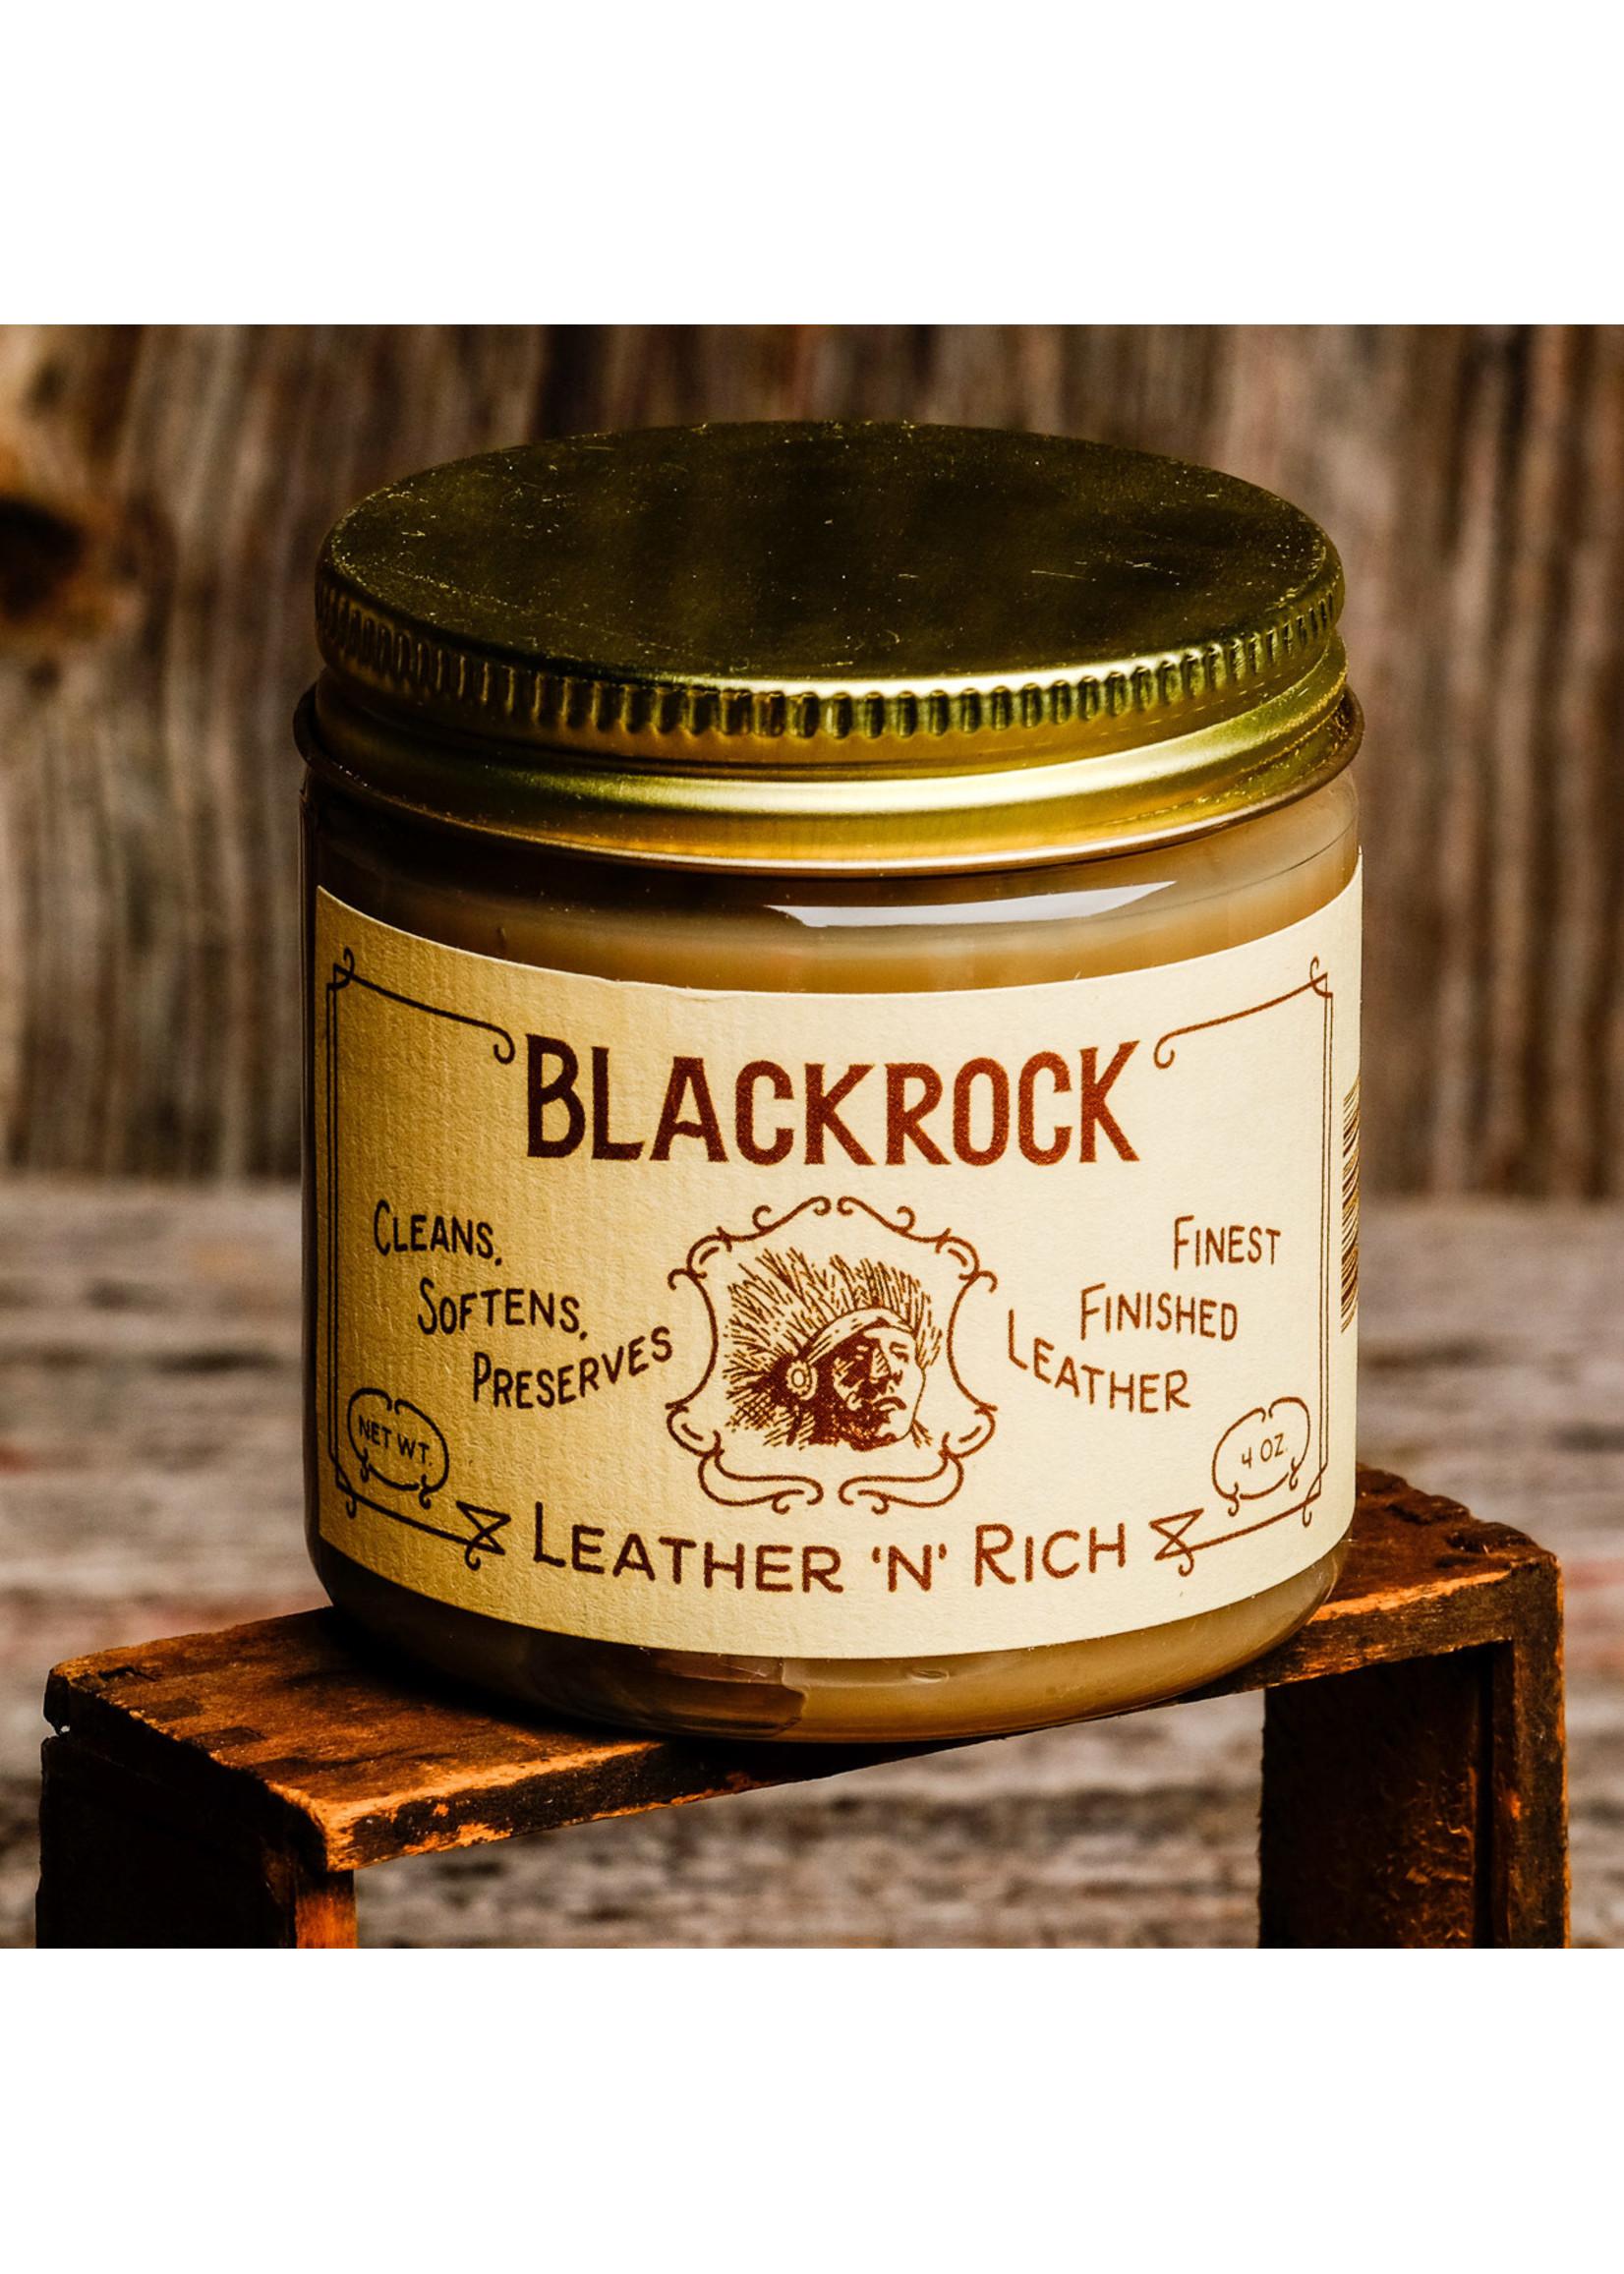 Blackrock Leather Conditioner